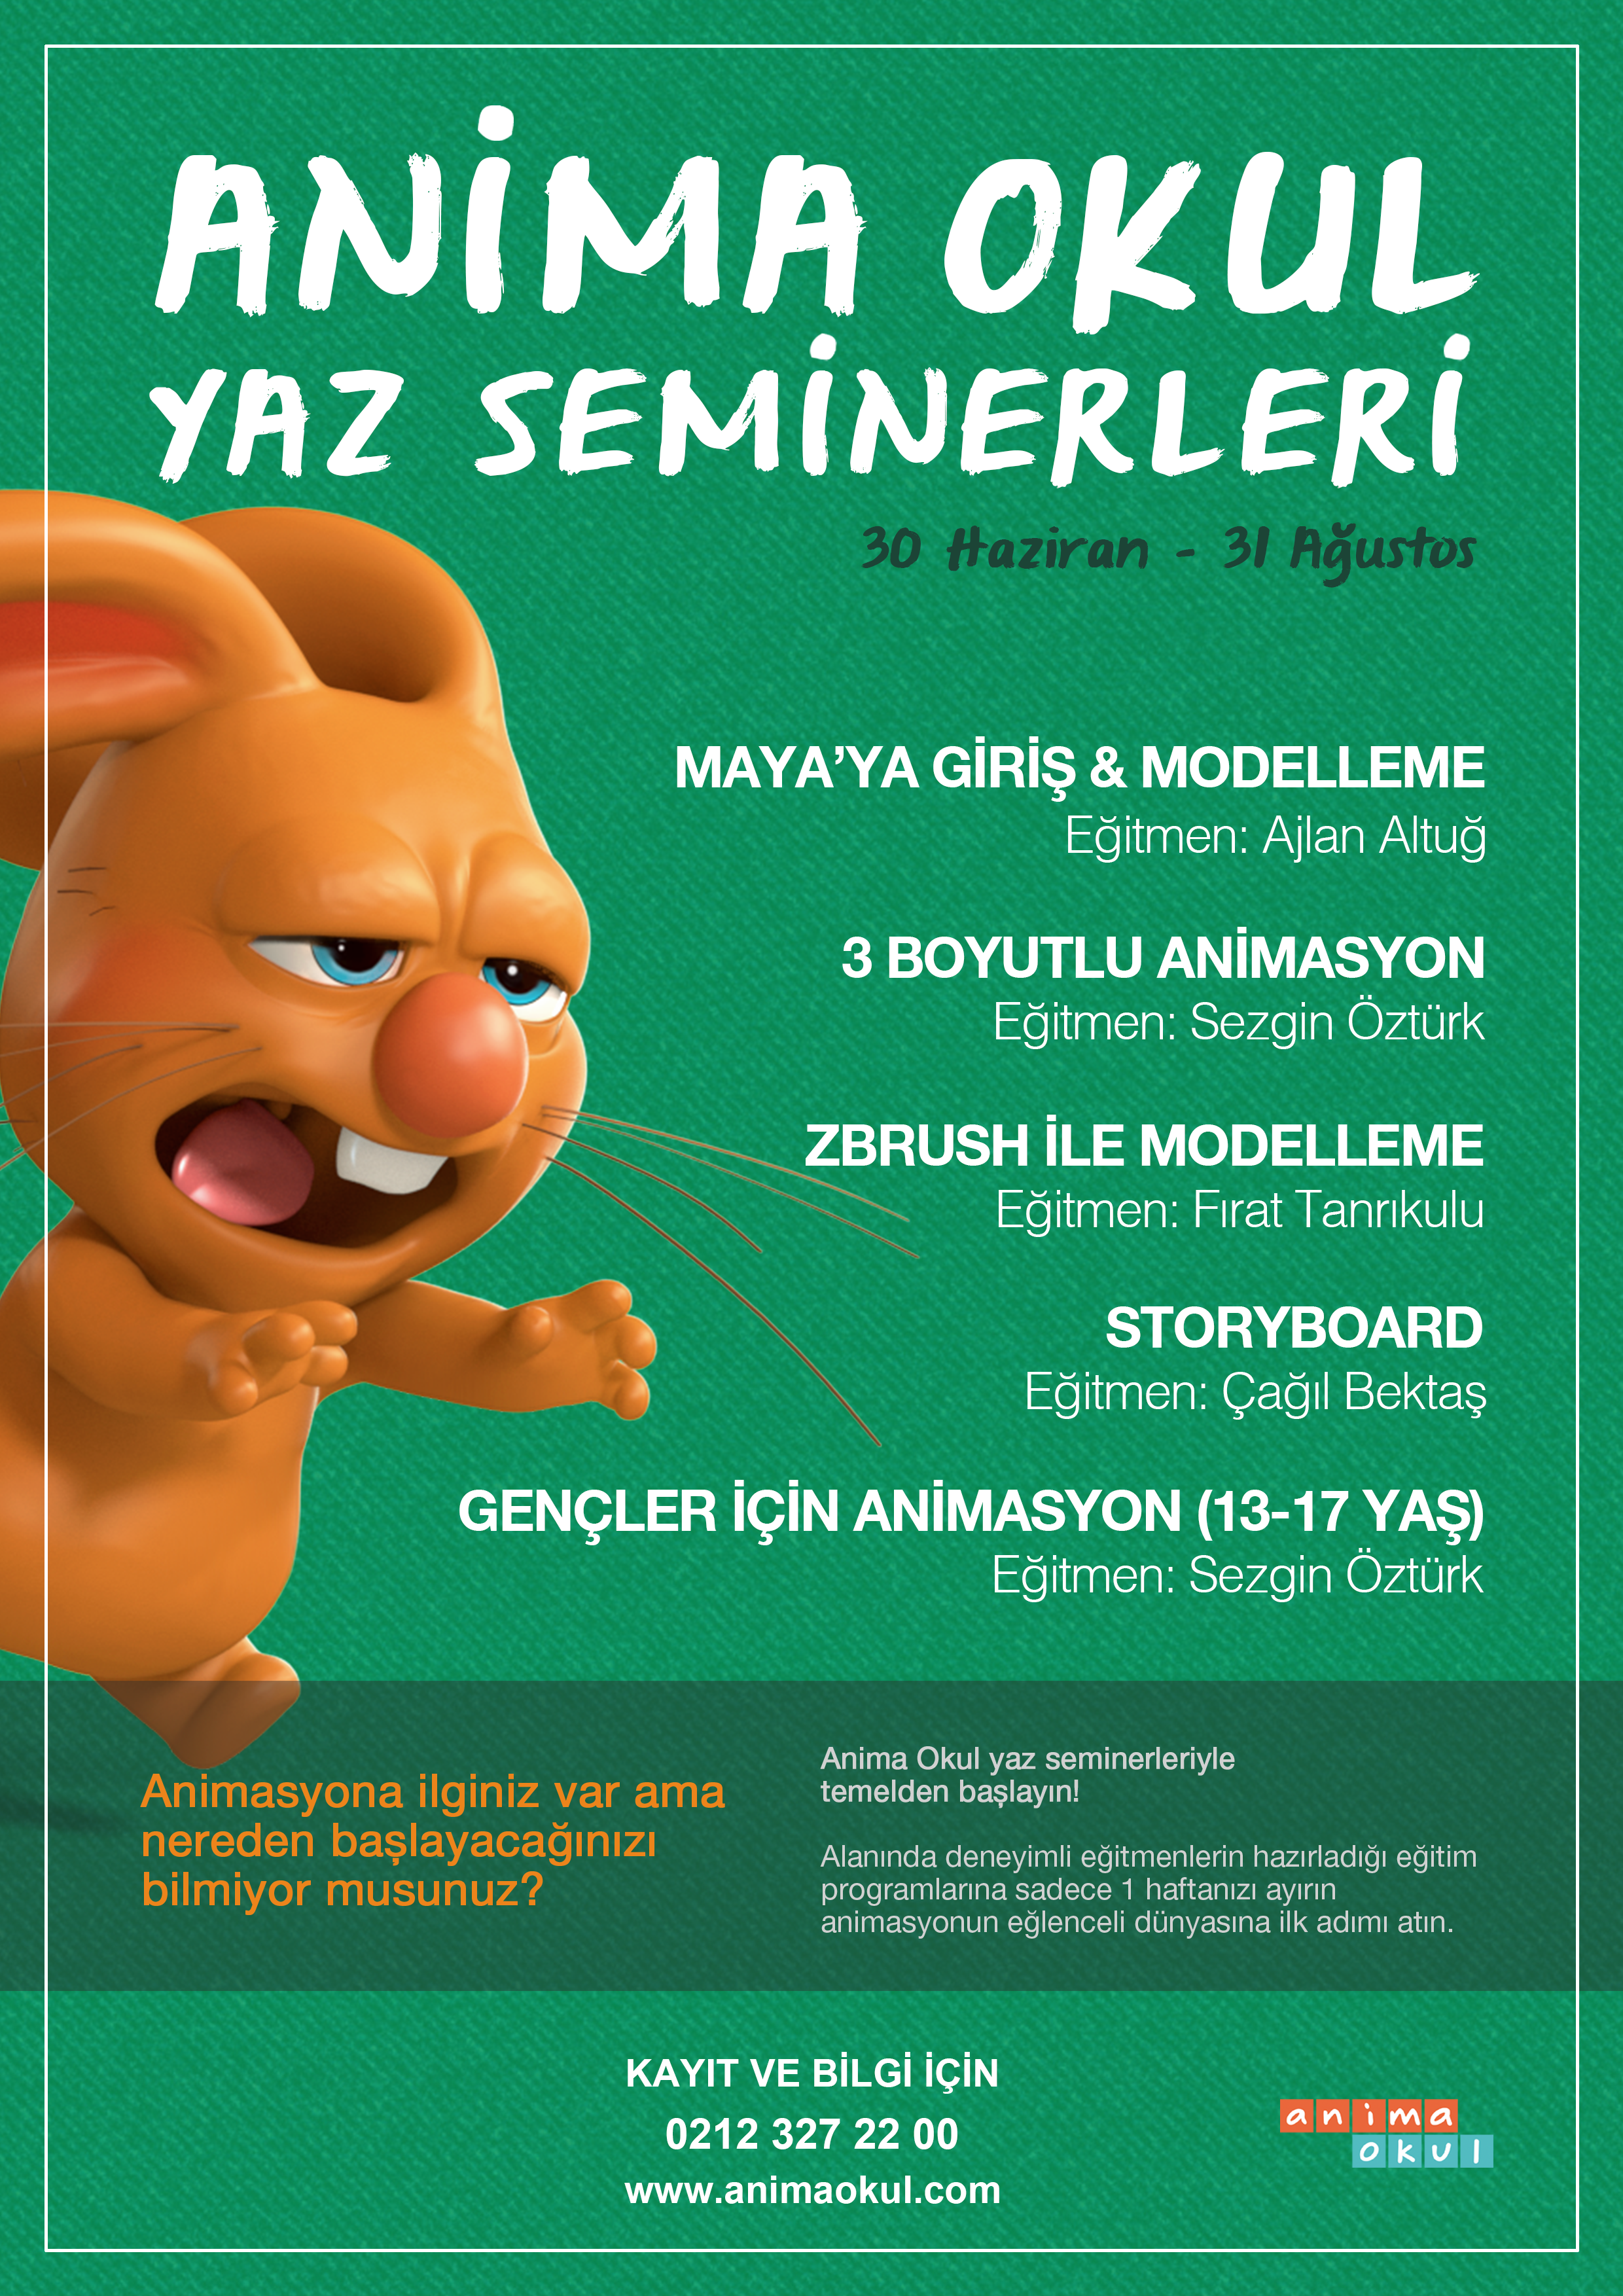 AnimaOkul_yazSeminerleri_poster